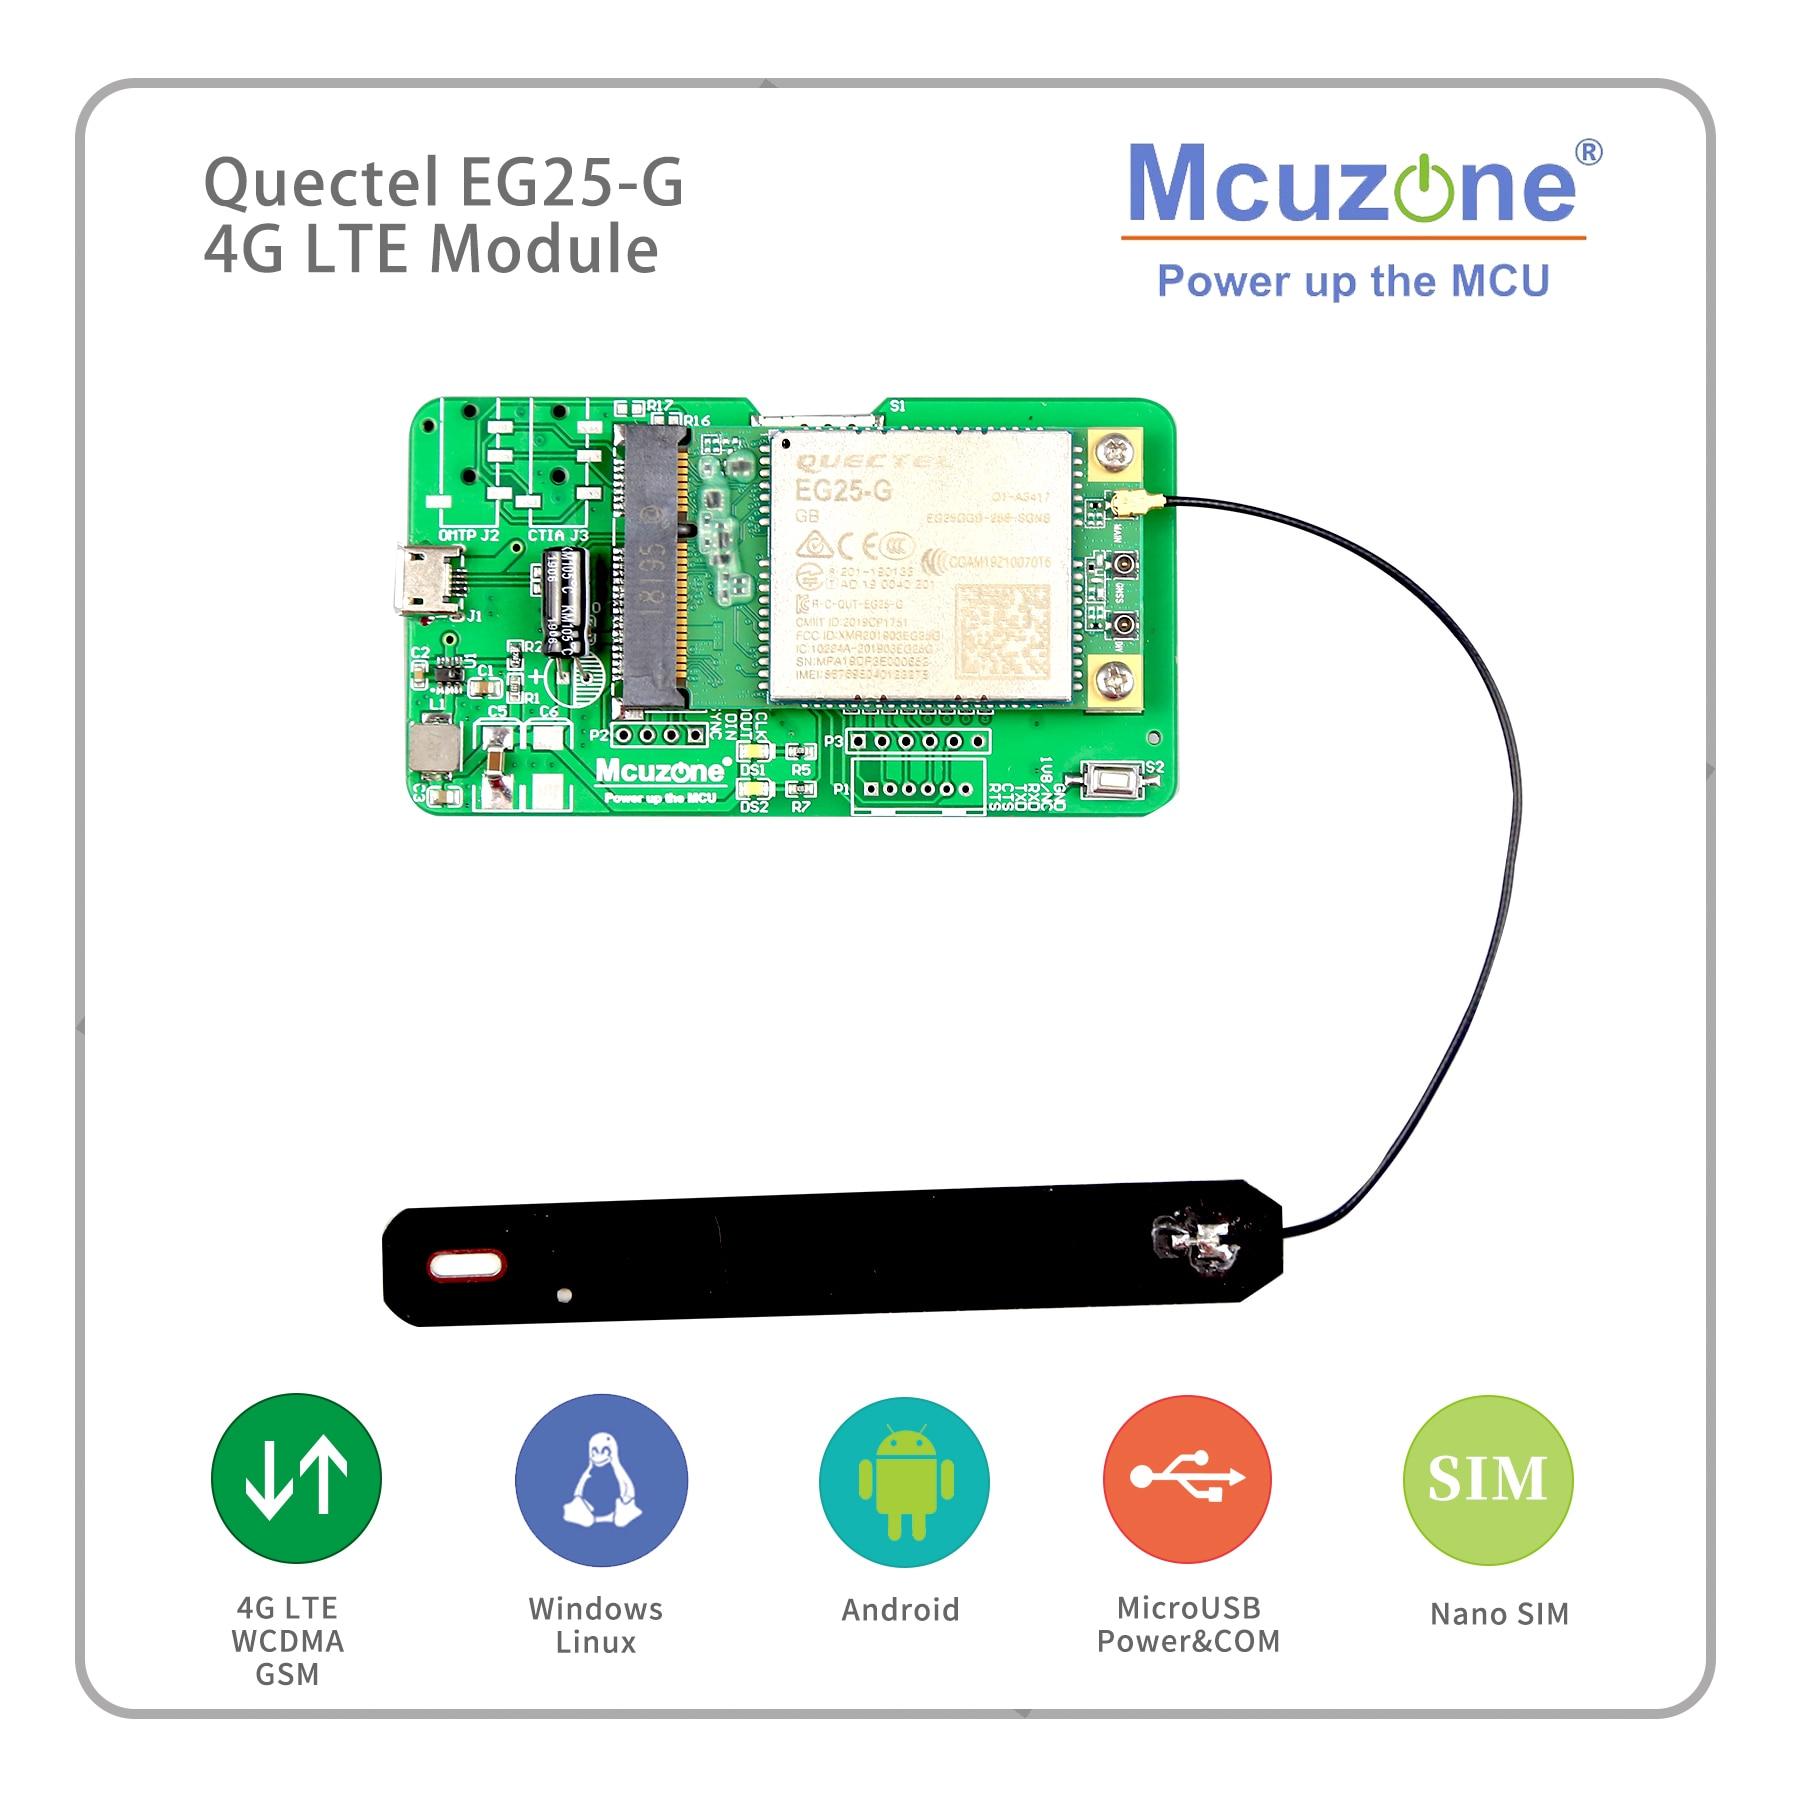 Quectel EG25-G глобальная полоса 4G LTE WCDMA GSM GPRS, для Raspberry Pi Rockchip ARM Android Linux Wince Windows Quectel EG25